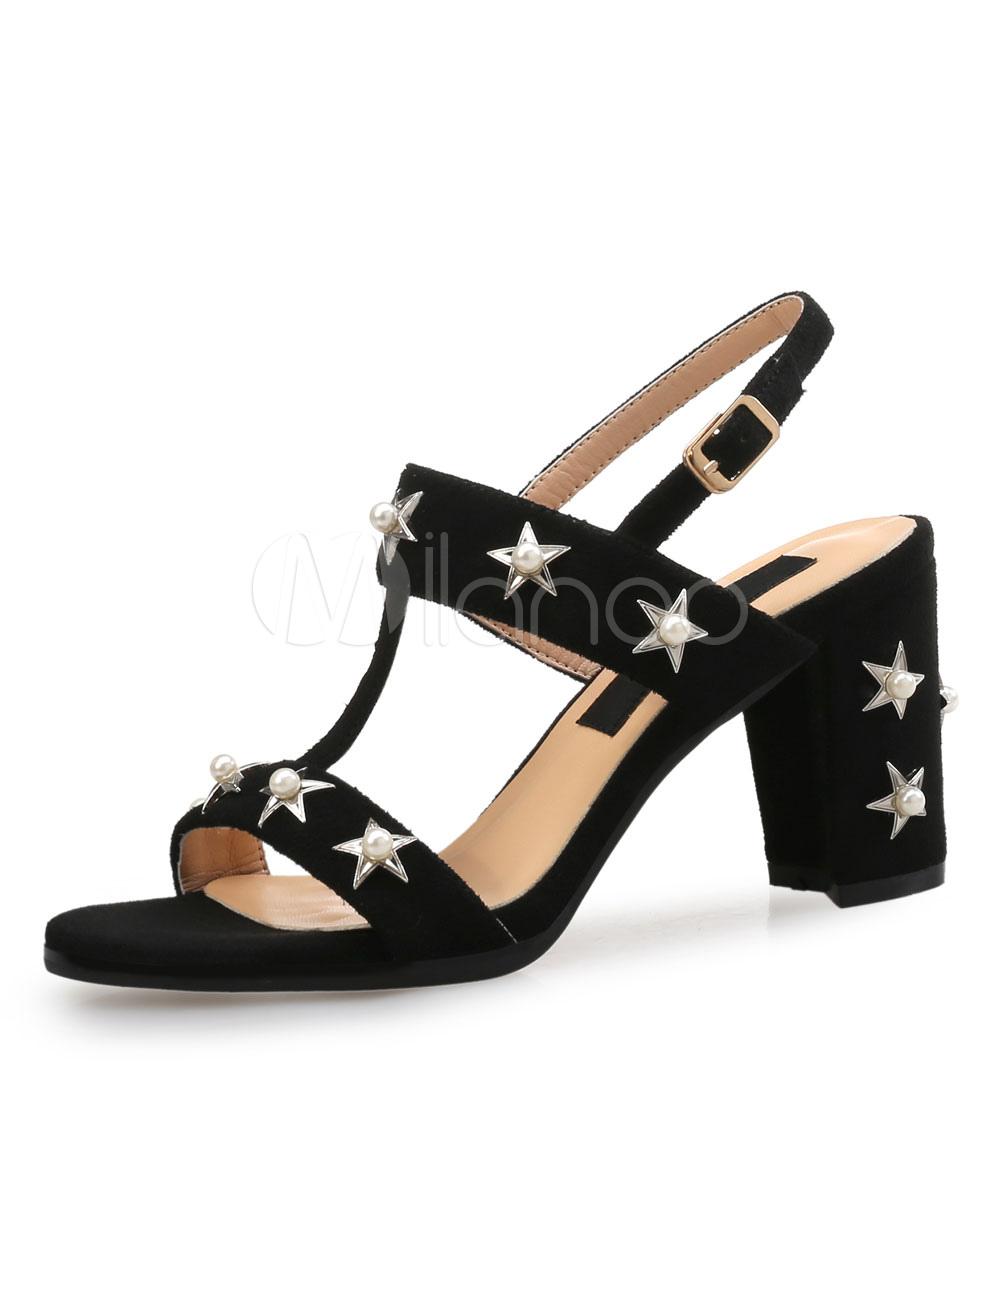 High Heel Sandals Suede Open Toe T Type Stars Pearls Detail Chunky Heel Sandals Women Shoes